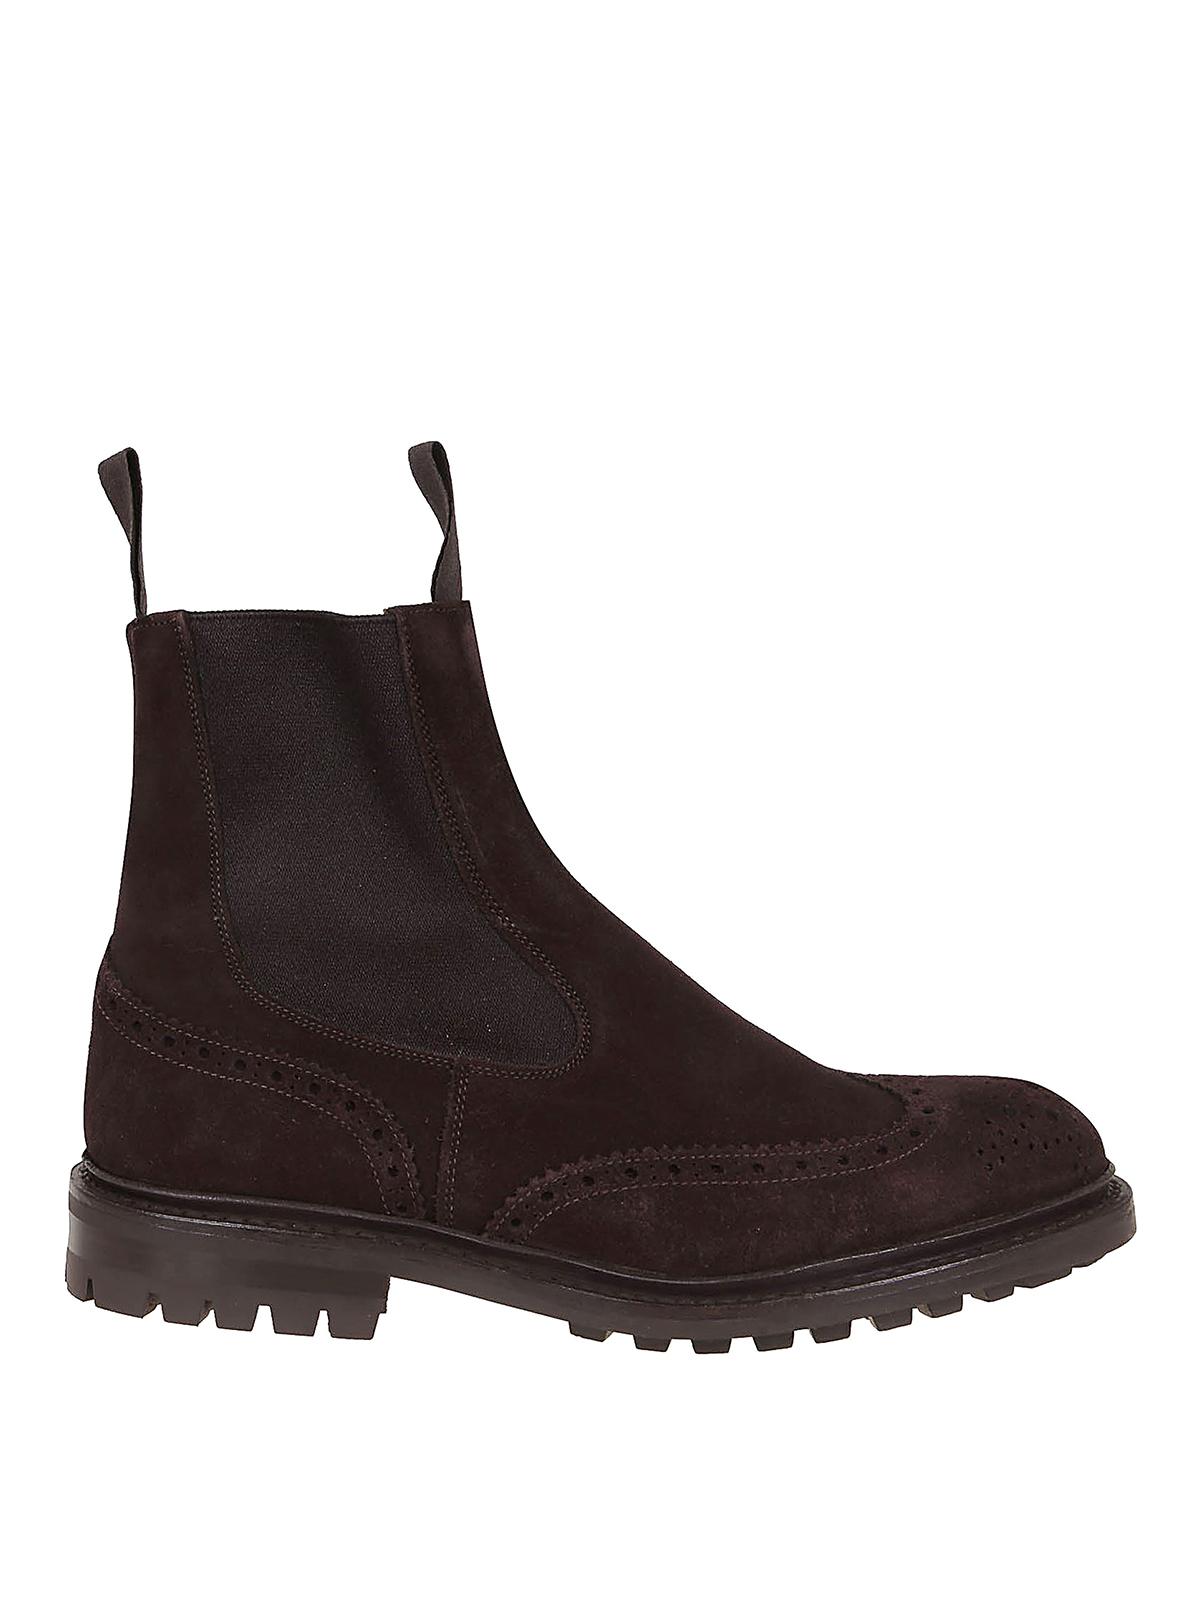 Tricker's - Henry Chelsea boots - نیم